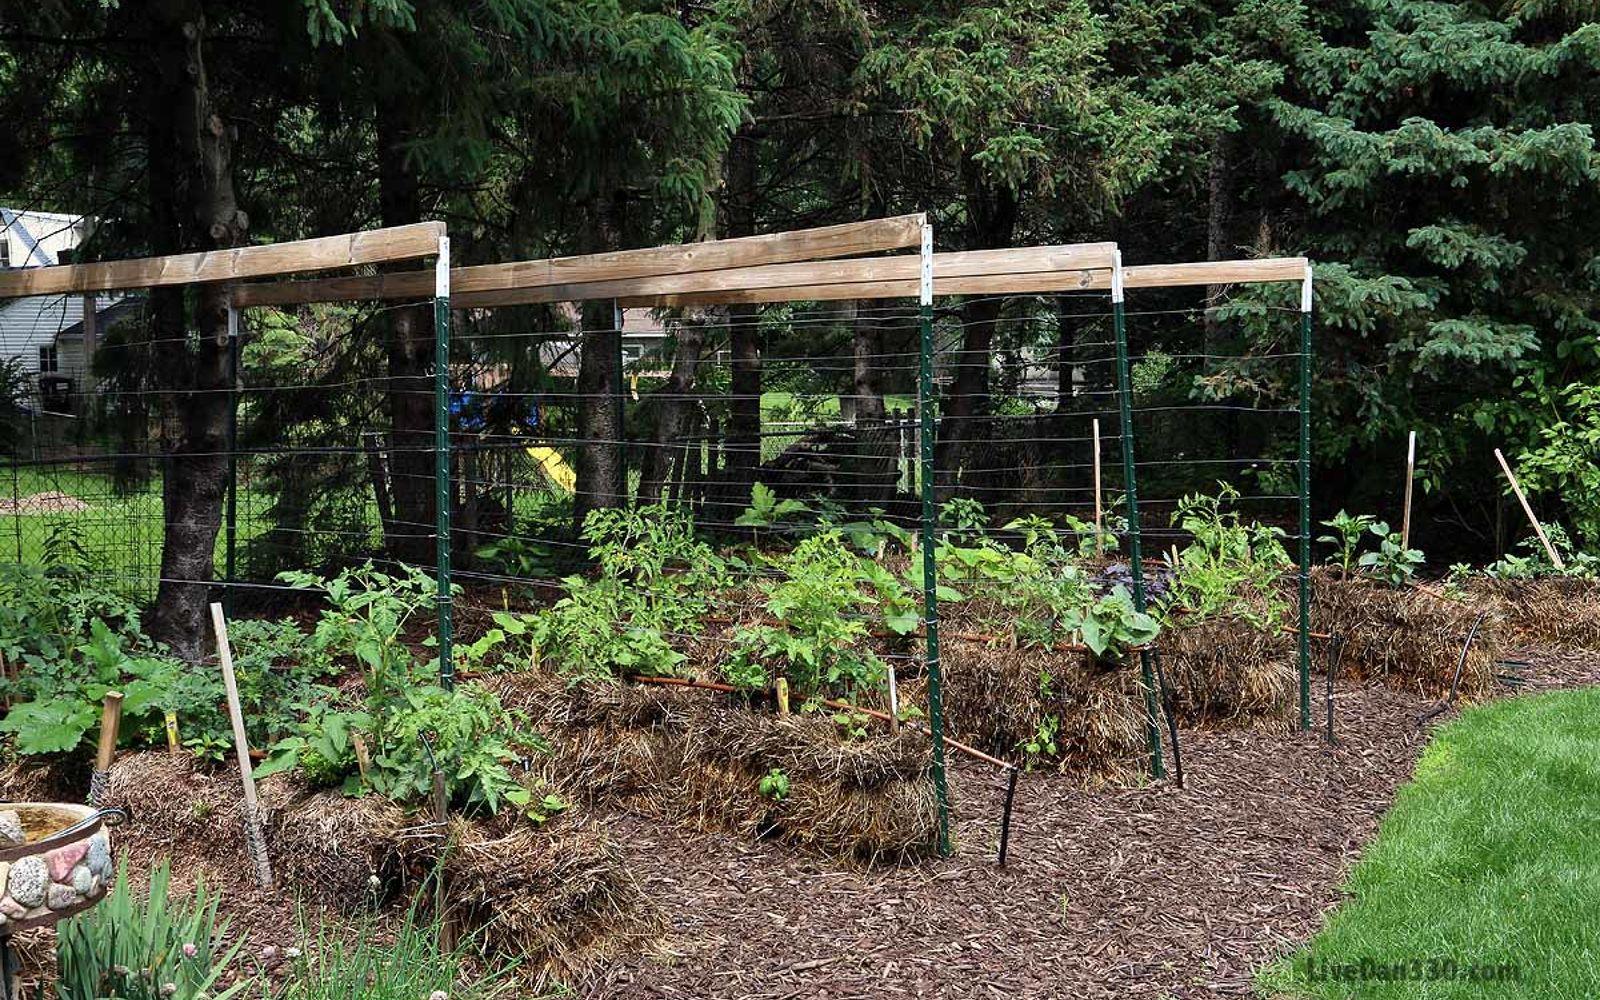 s 17 ways to build a gorgeous garden trellis this summer, gardening, Wrap wire lines around a few poles